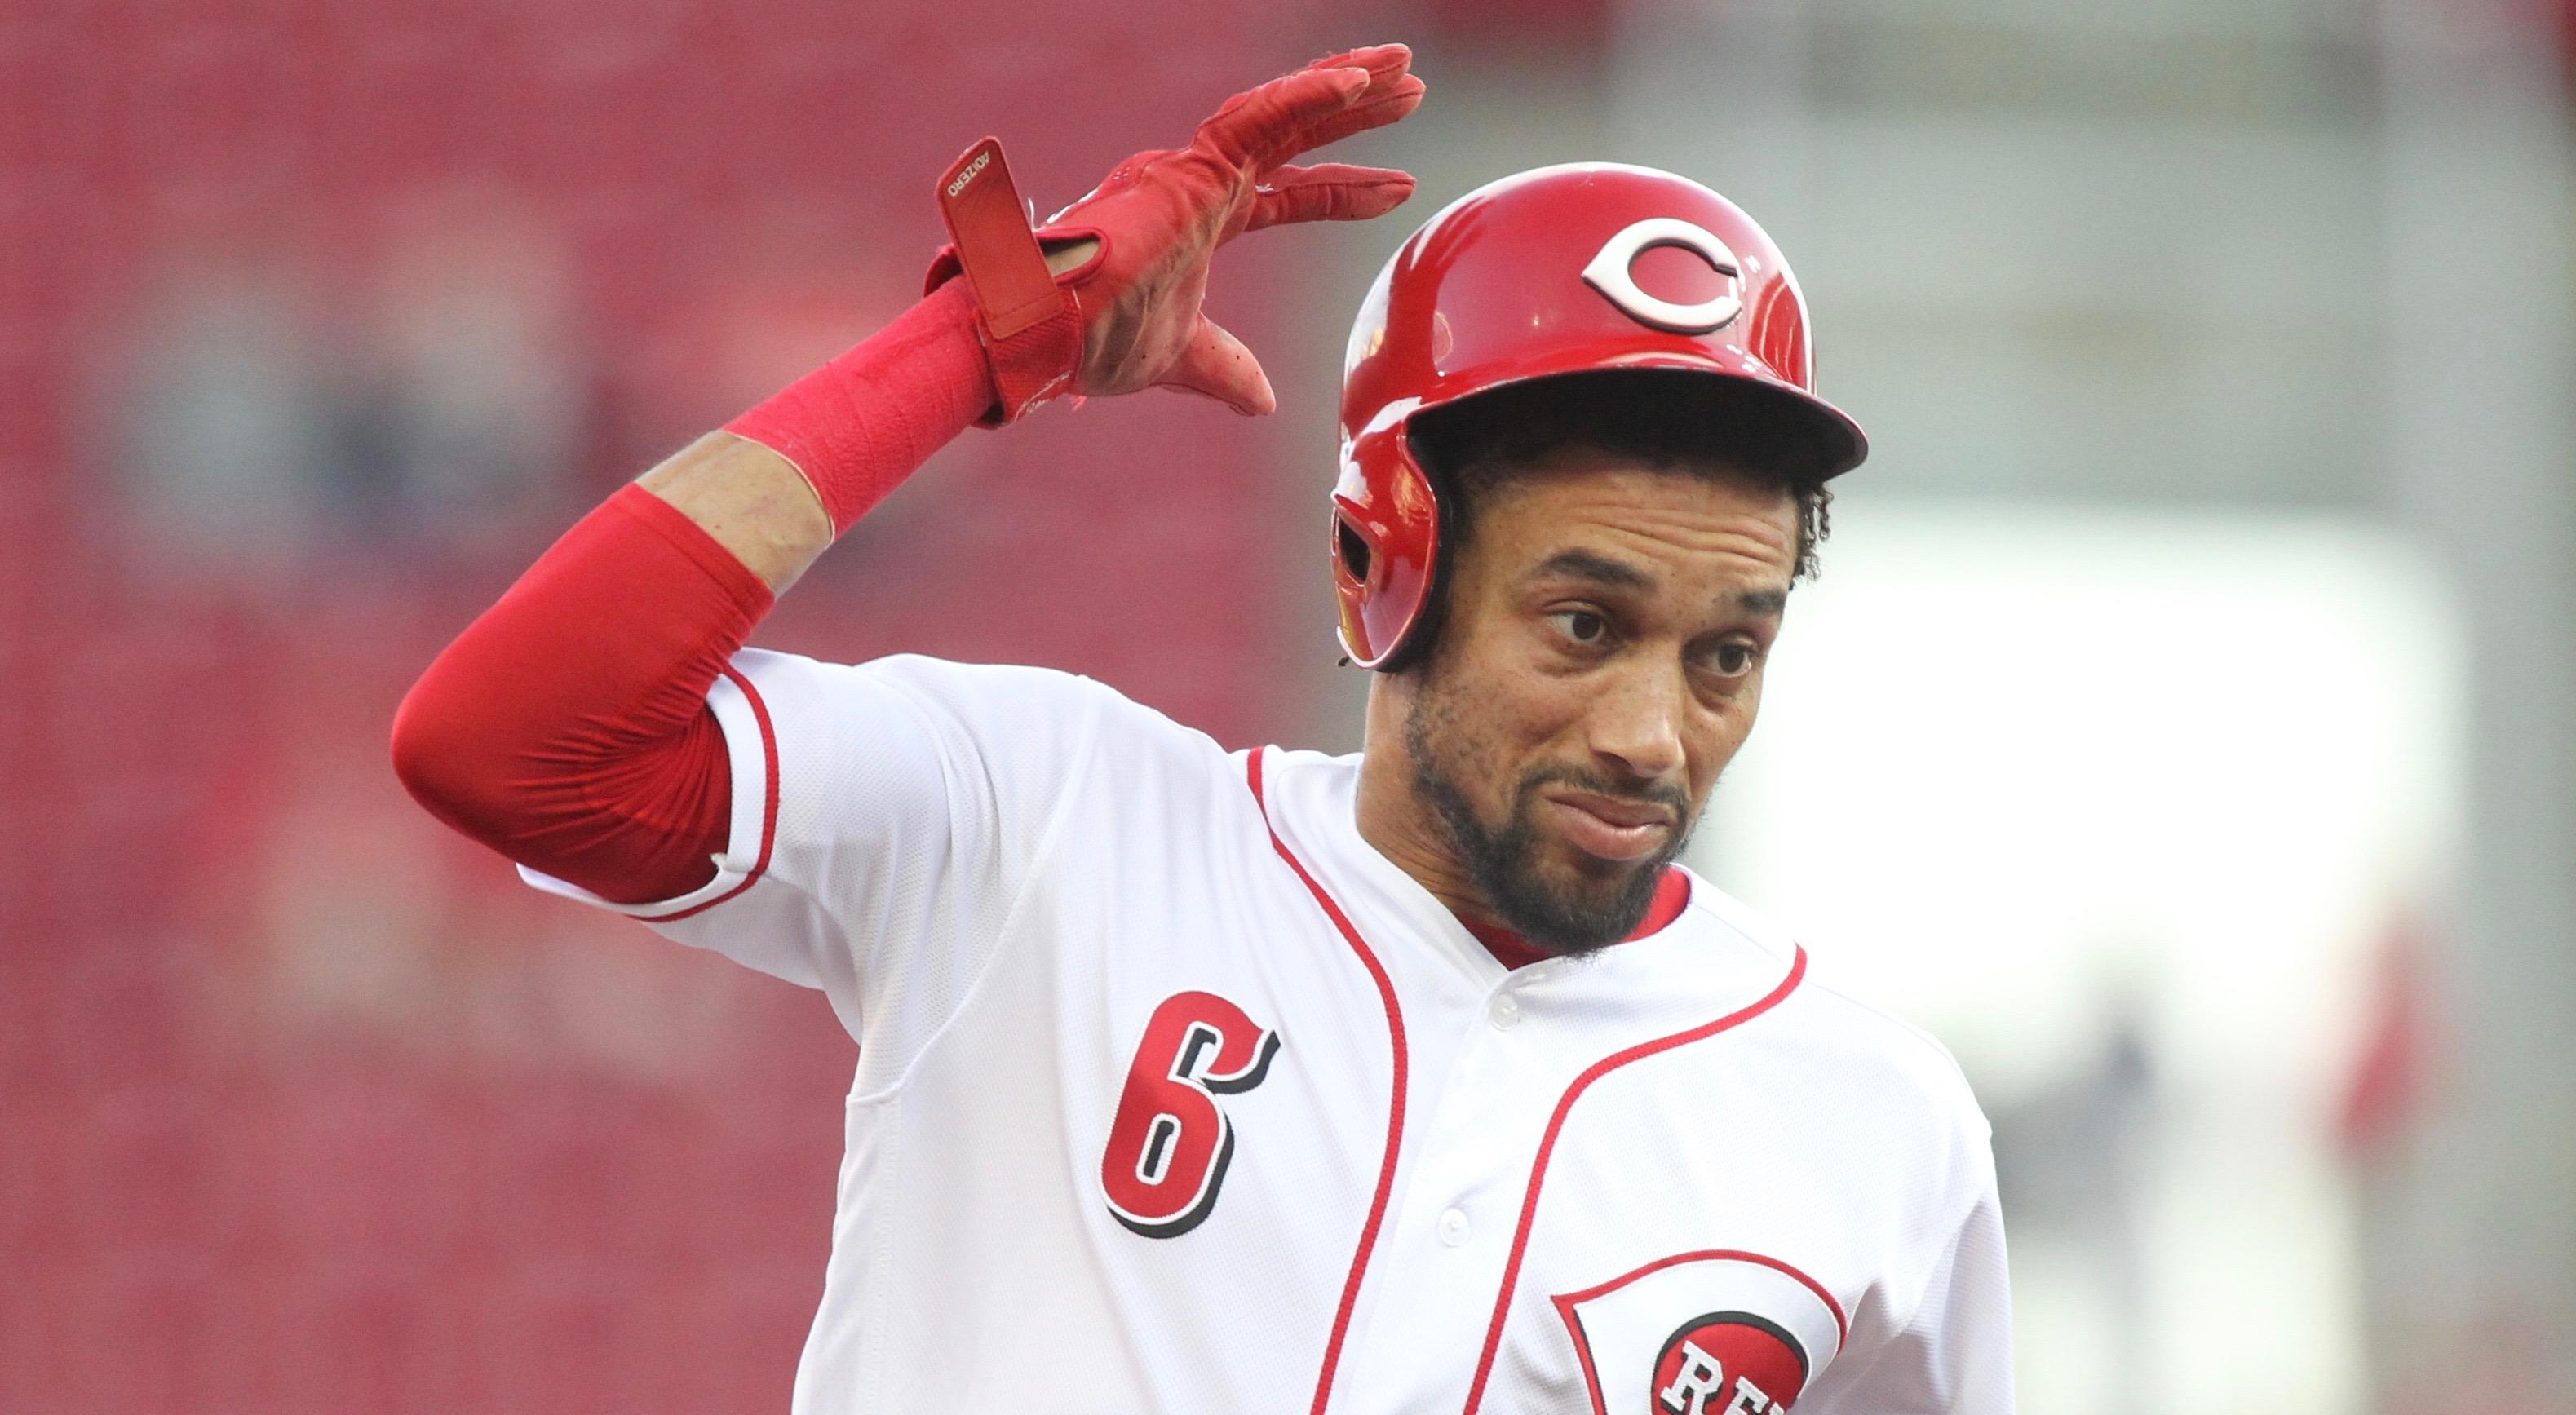 Cincinnati Reds: Billy Hamilton sets career high for games played